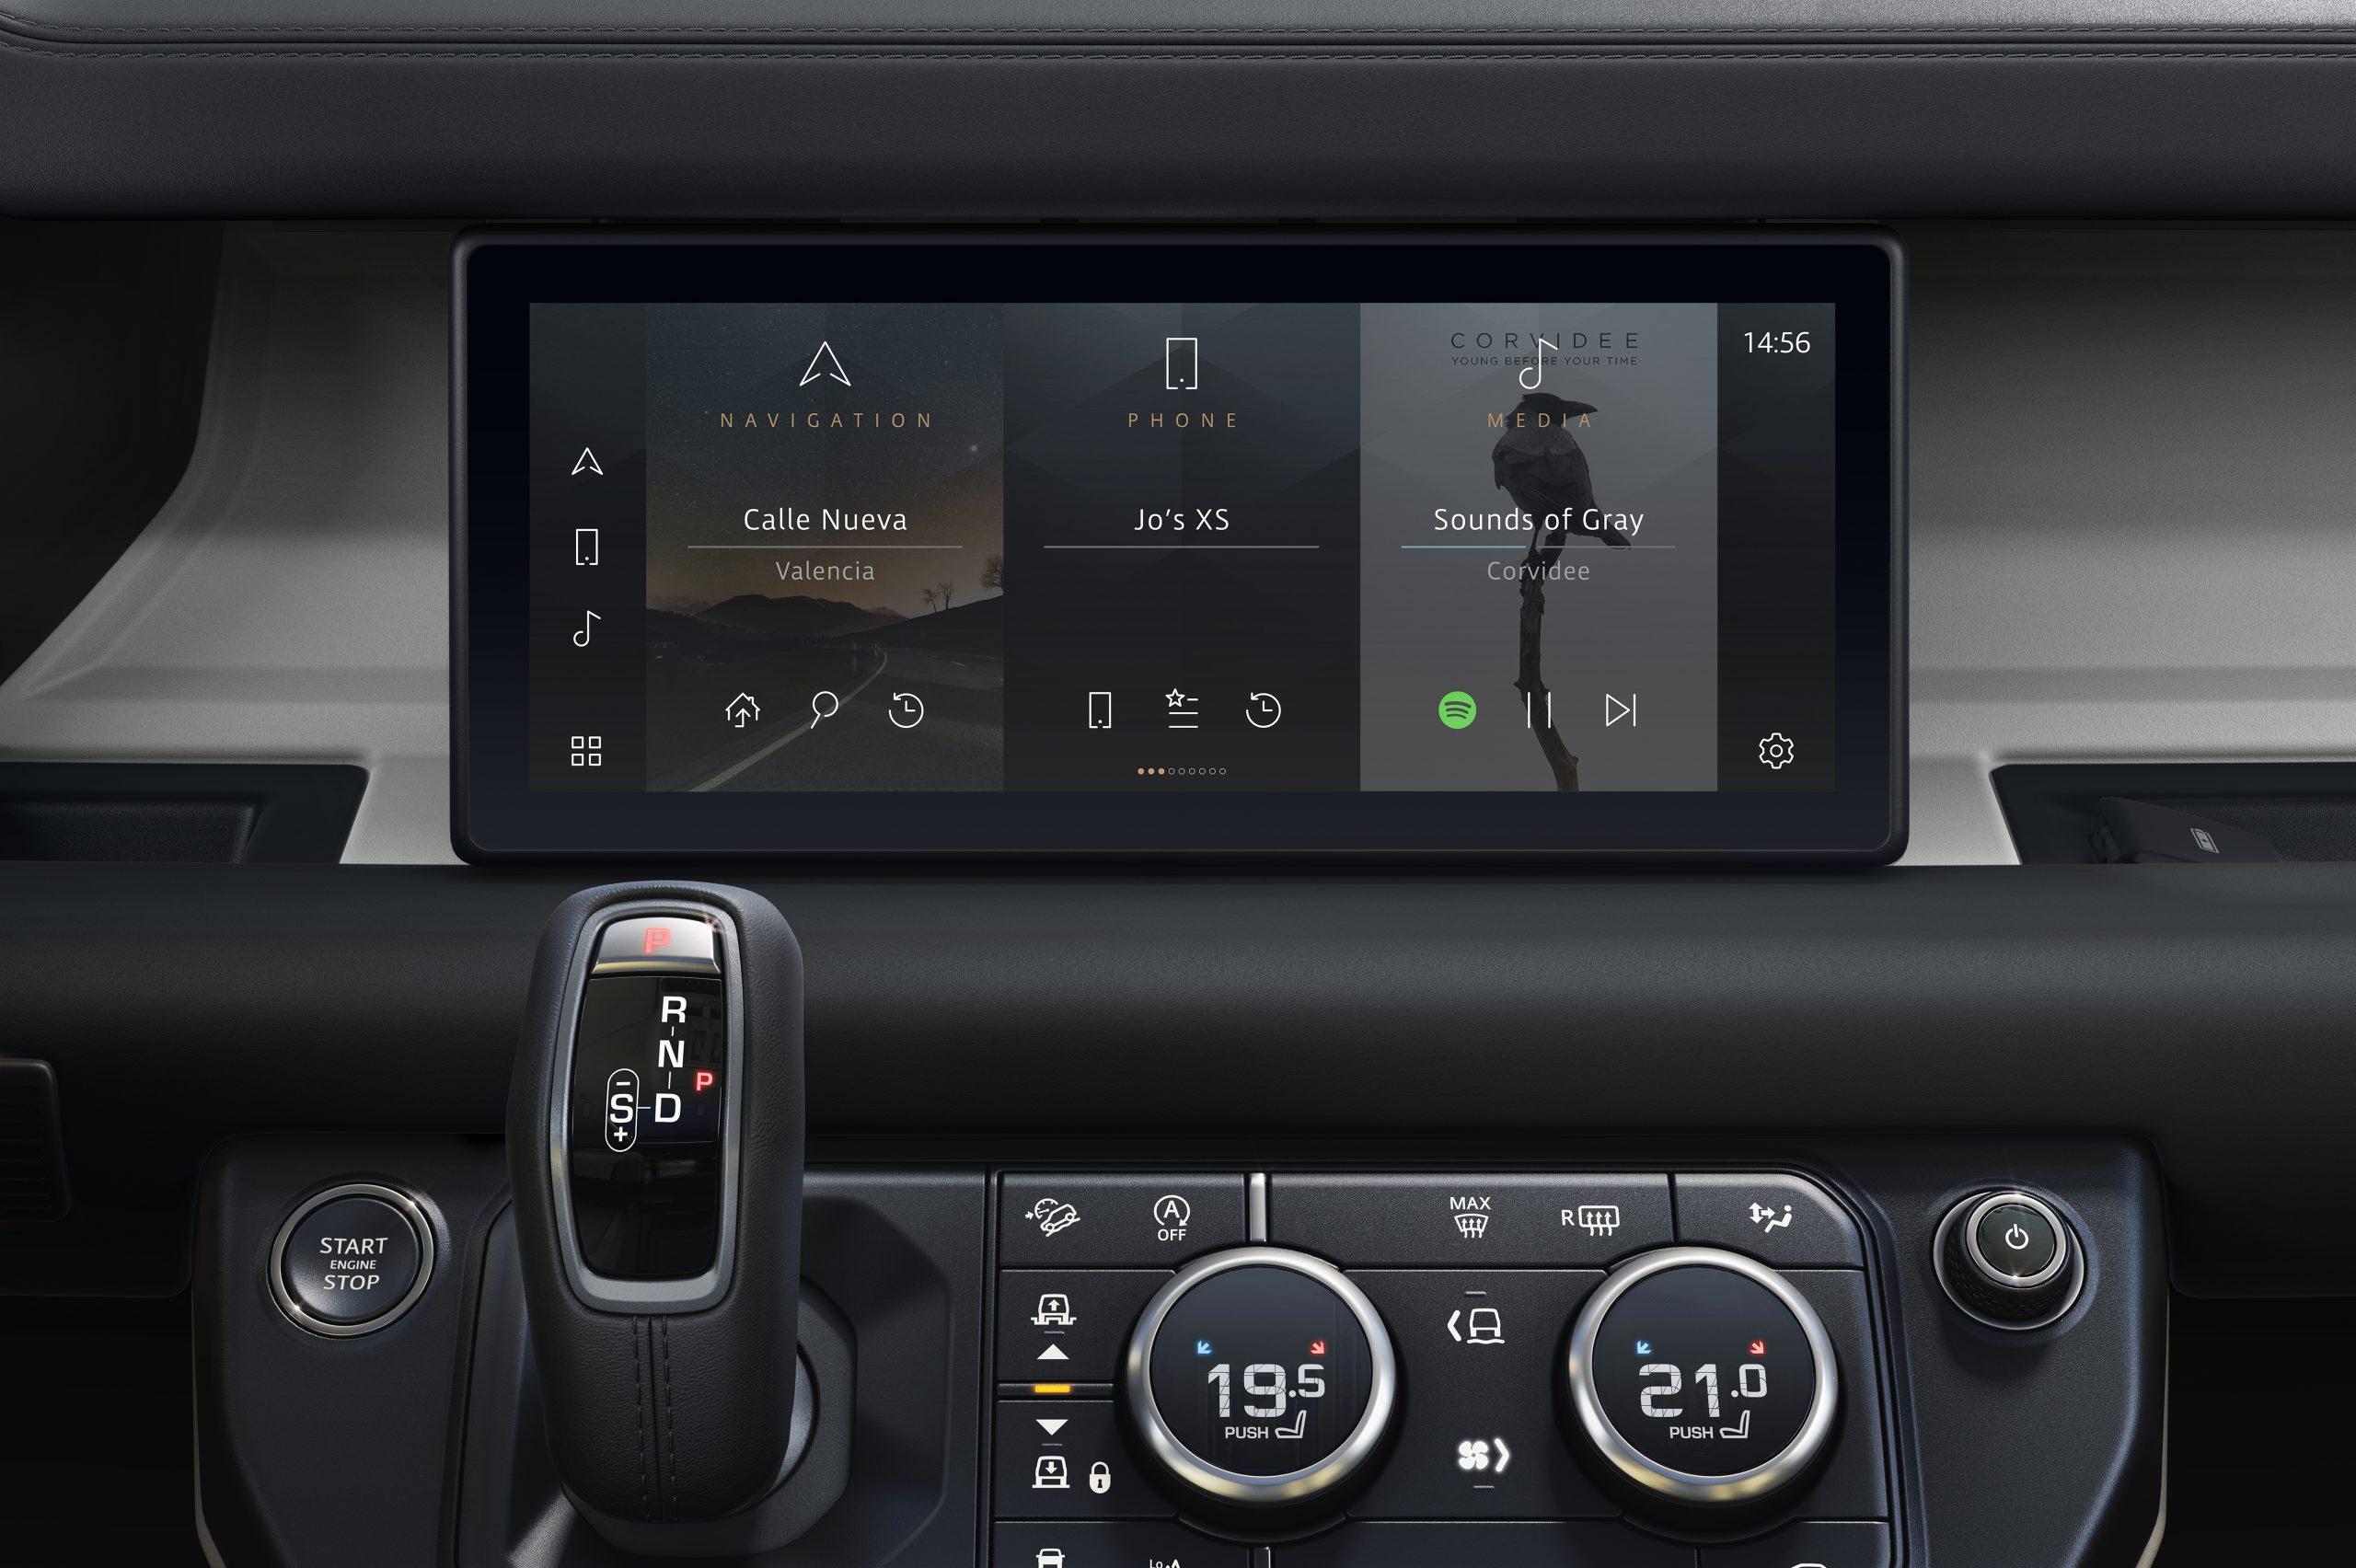 2020 Land Rover Defender interior pivi infotainment